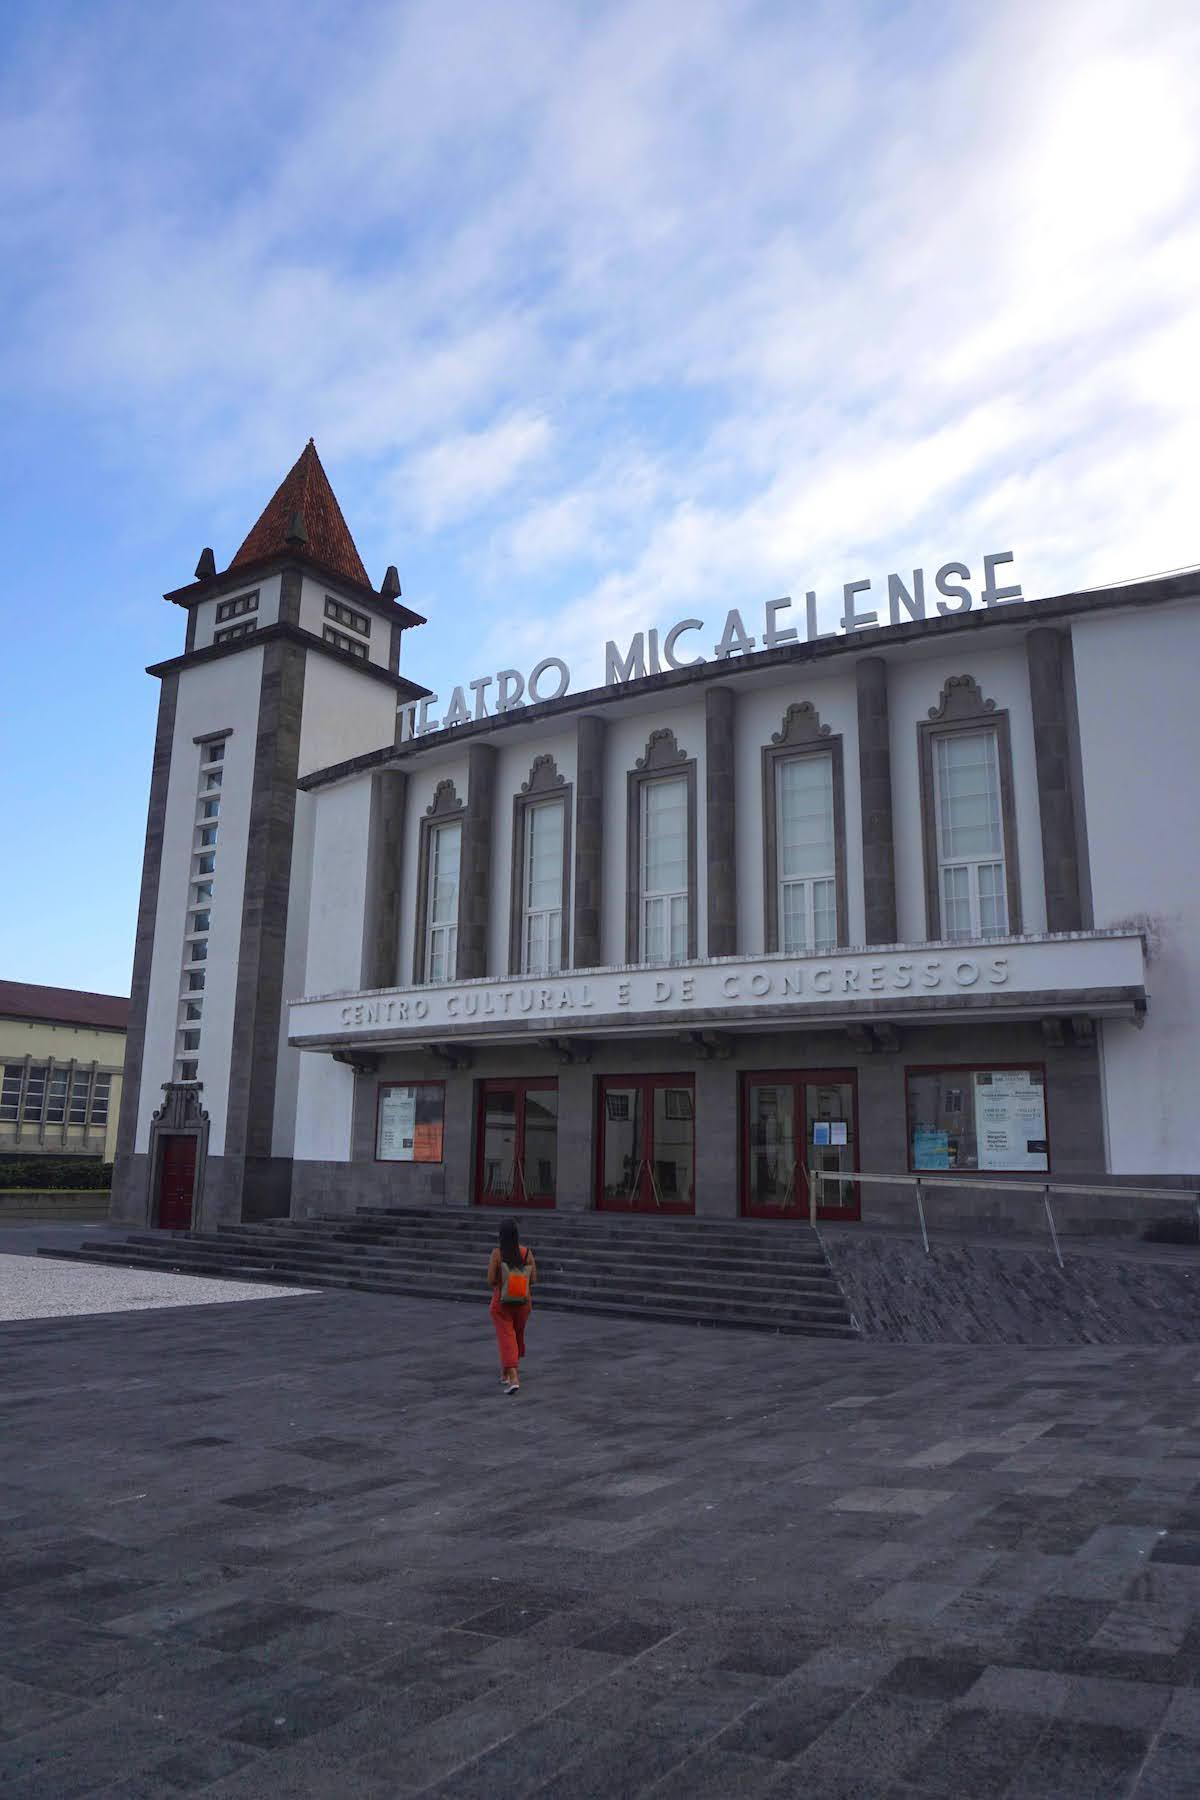 En la plaza del Teatro Micaelense